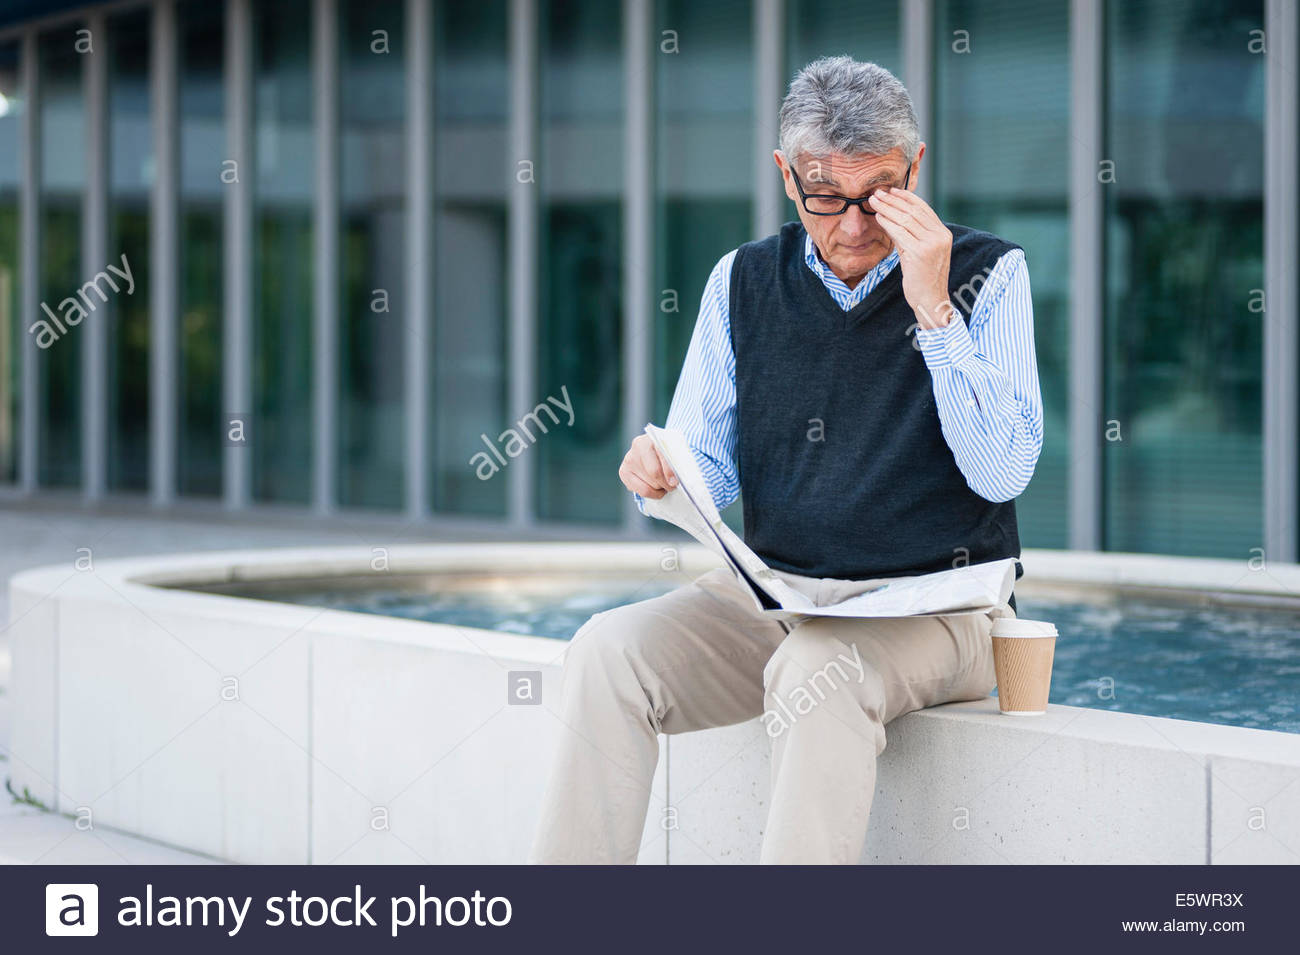 Senior adult businessman reading newspaper - Stock Image